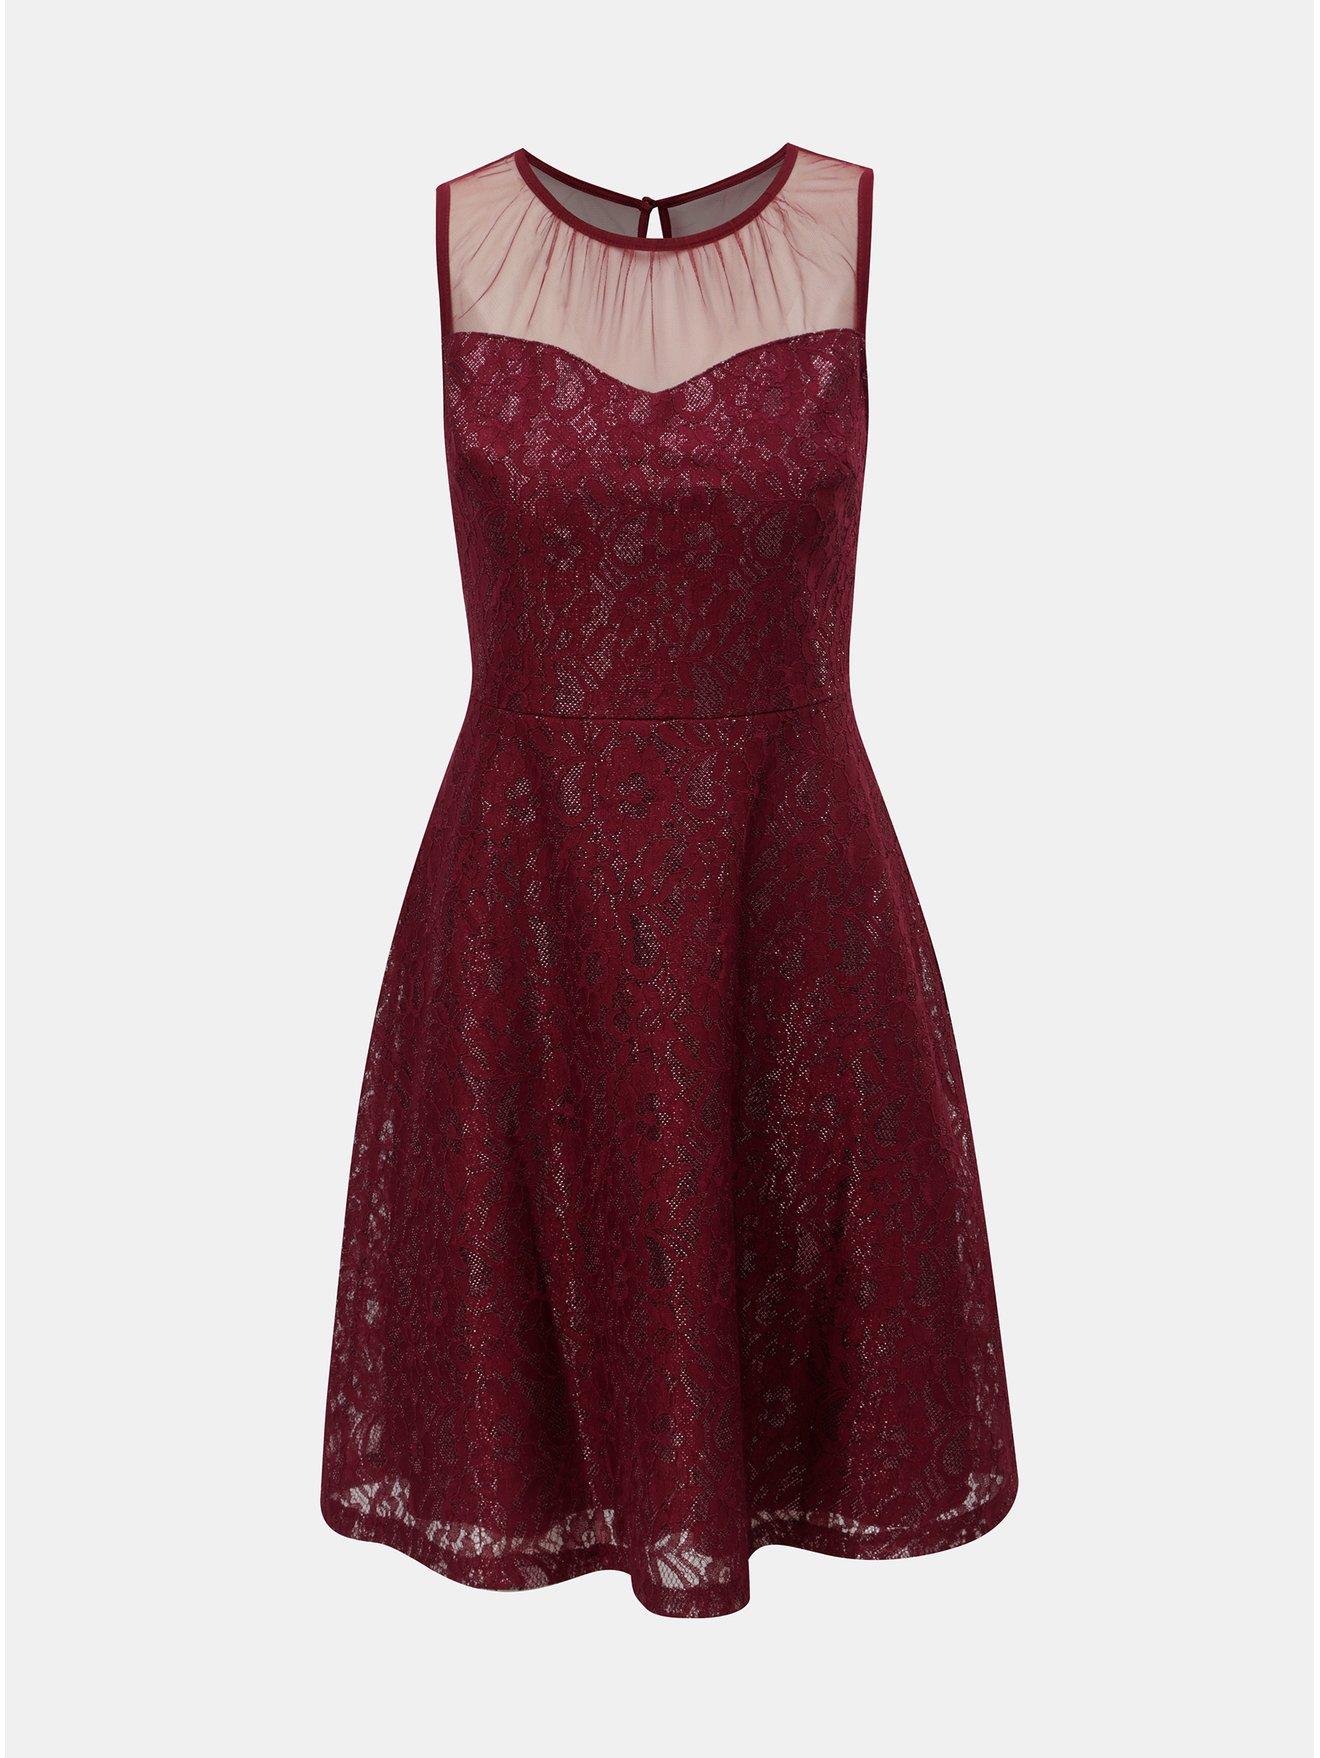 6d9e96c908e Vínové krajkové šaty s průsvitným detailem Dorothy Perkins